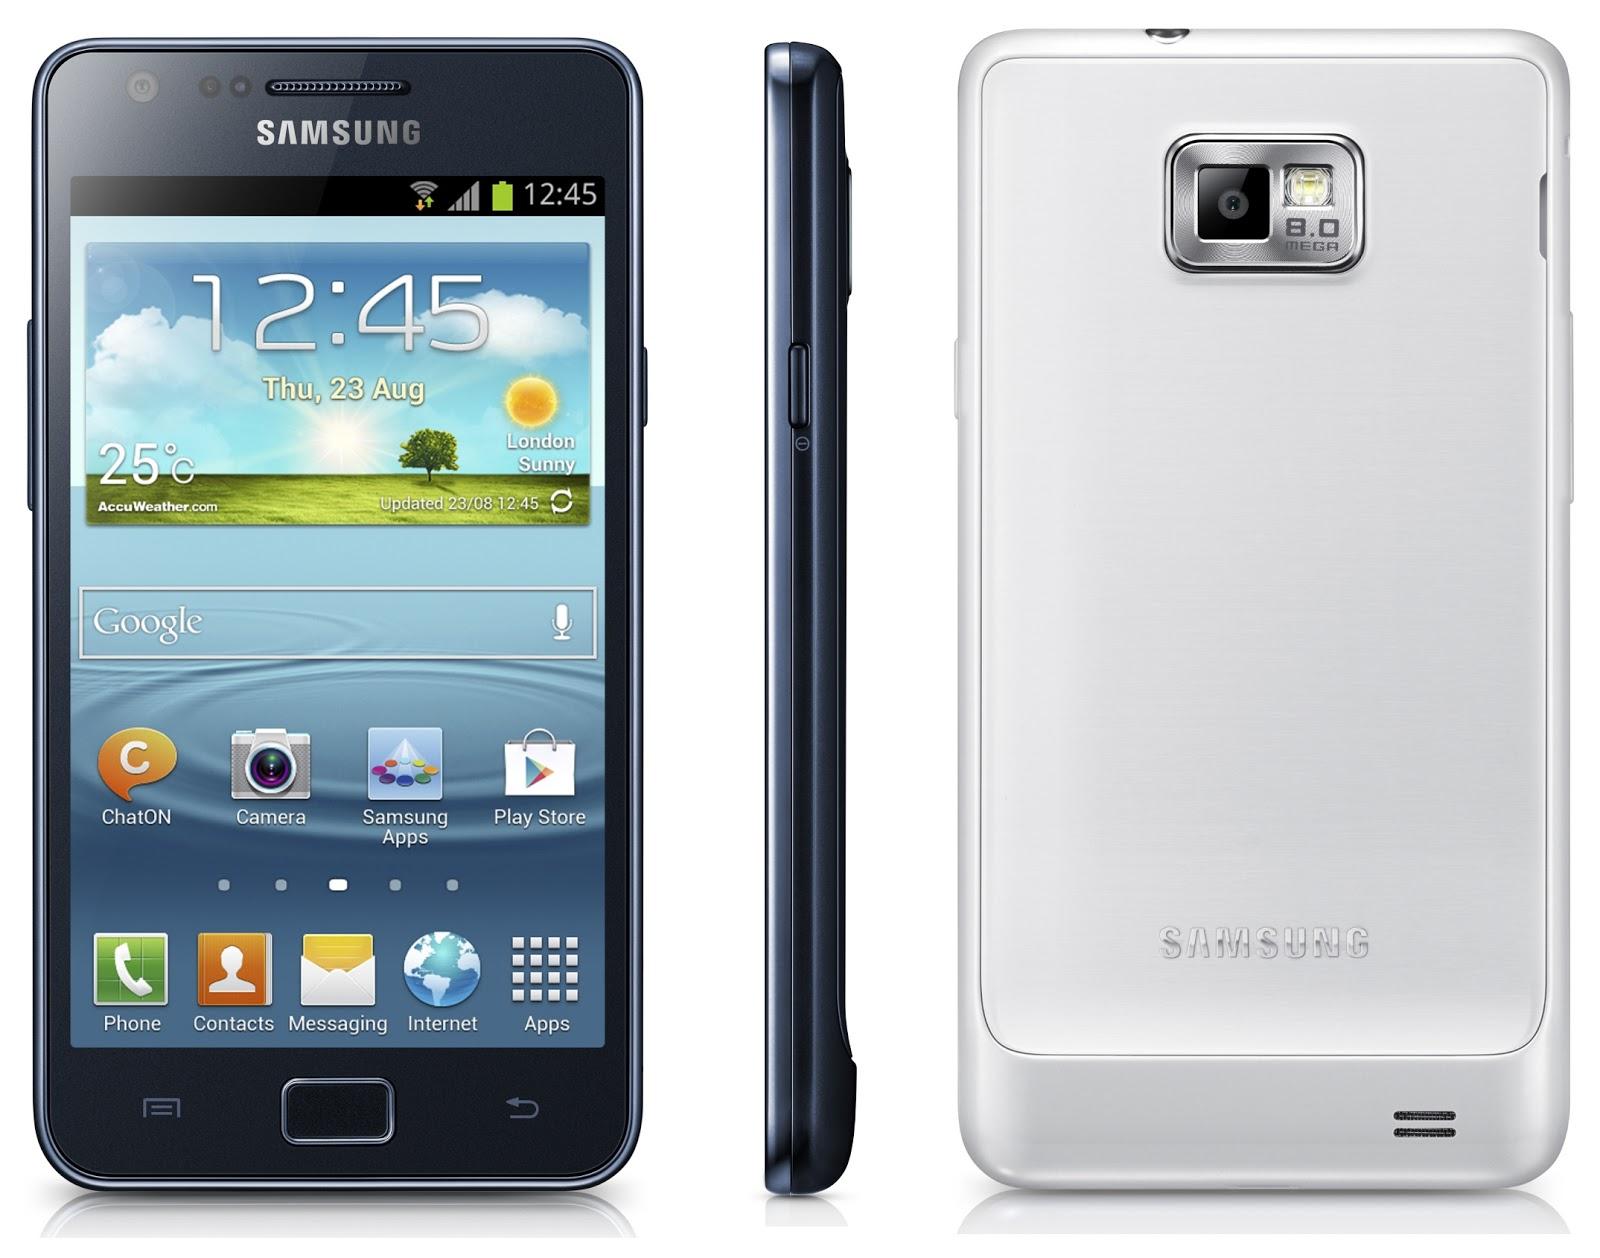 COMPARISON BETWEEN SAMSUNG GALAXY S SERIES PHONES LIKE ...